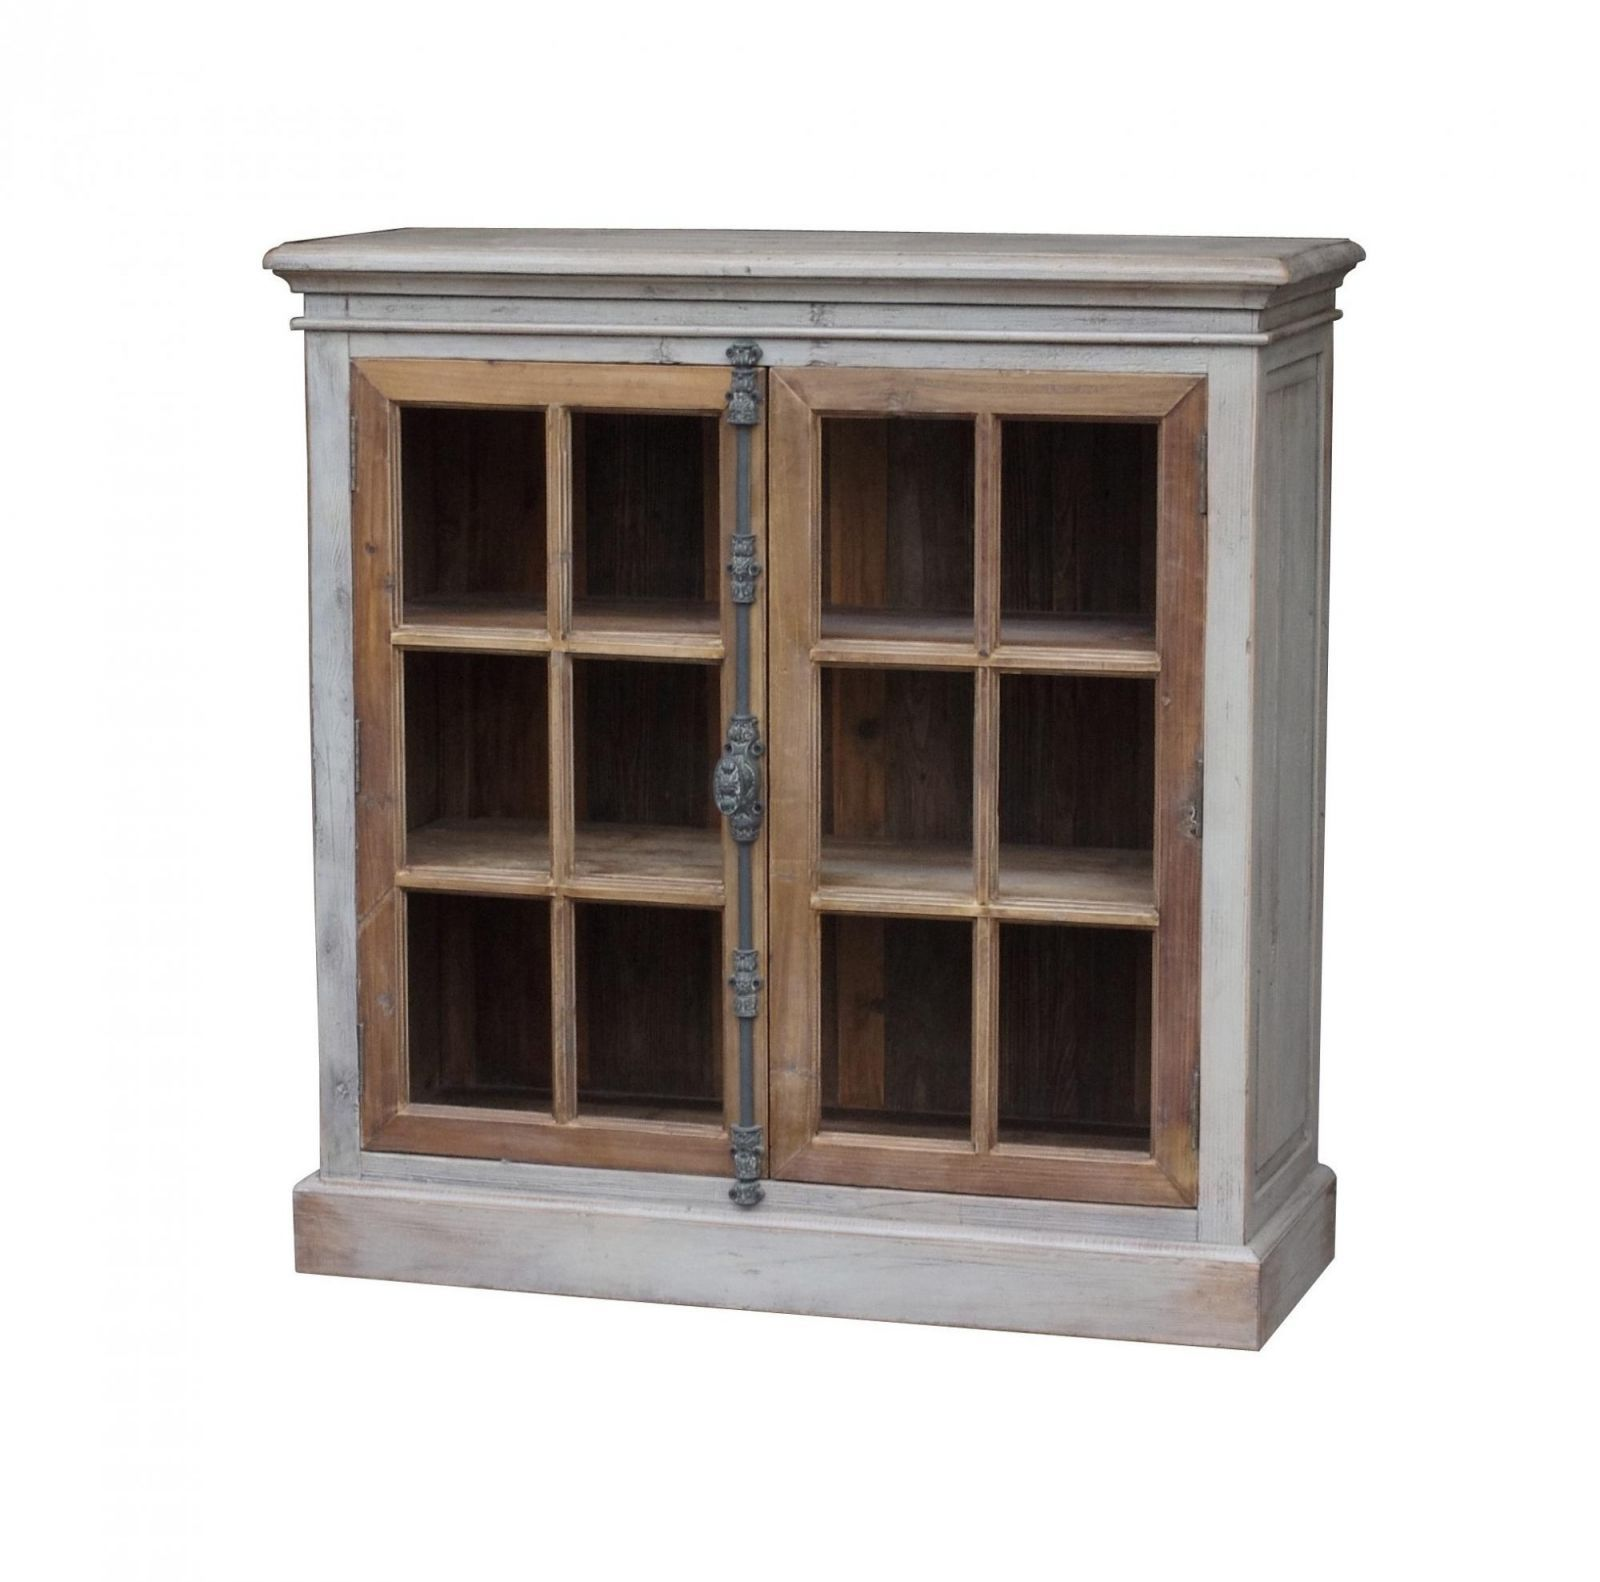 Restoration hardware style french casement glass door - Restoration hardware cabinets ...